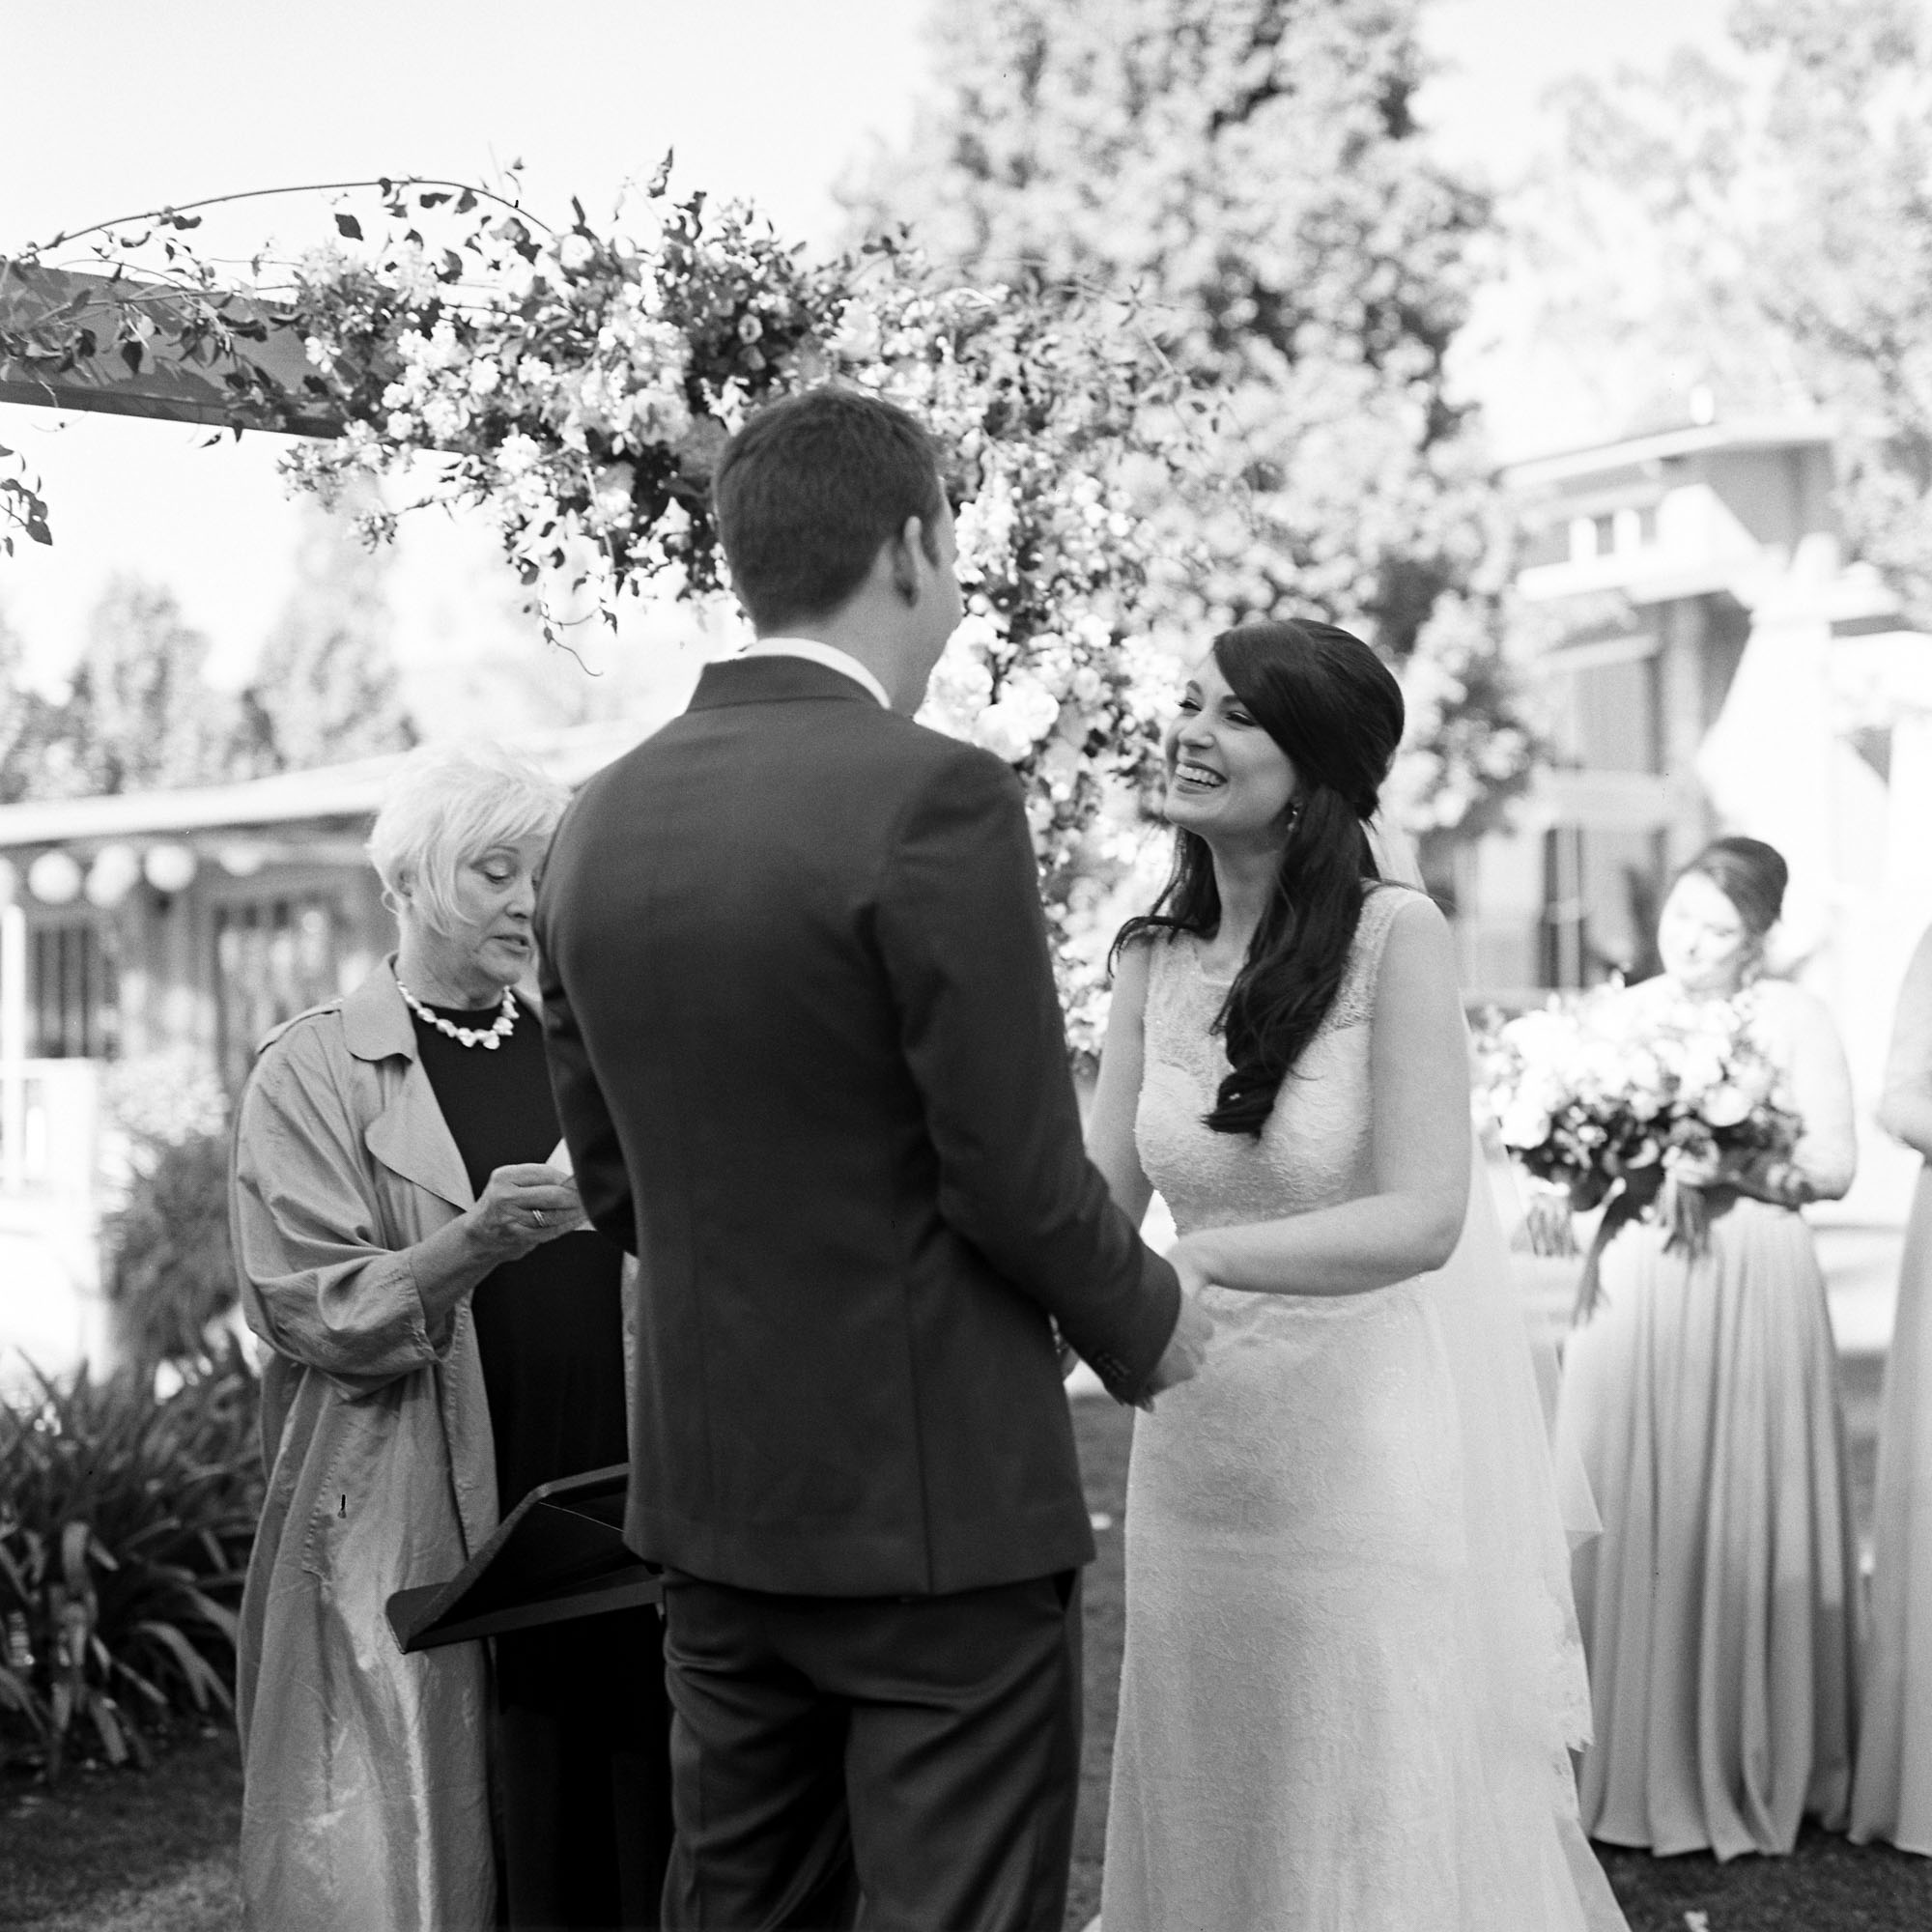 Glen-Ewin-Estate-wedding-photography-040.jpg